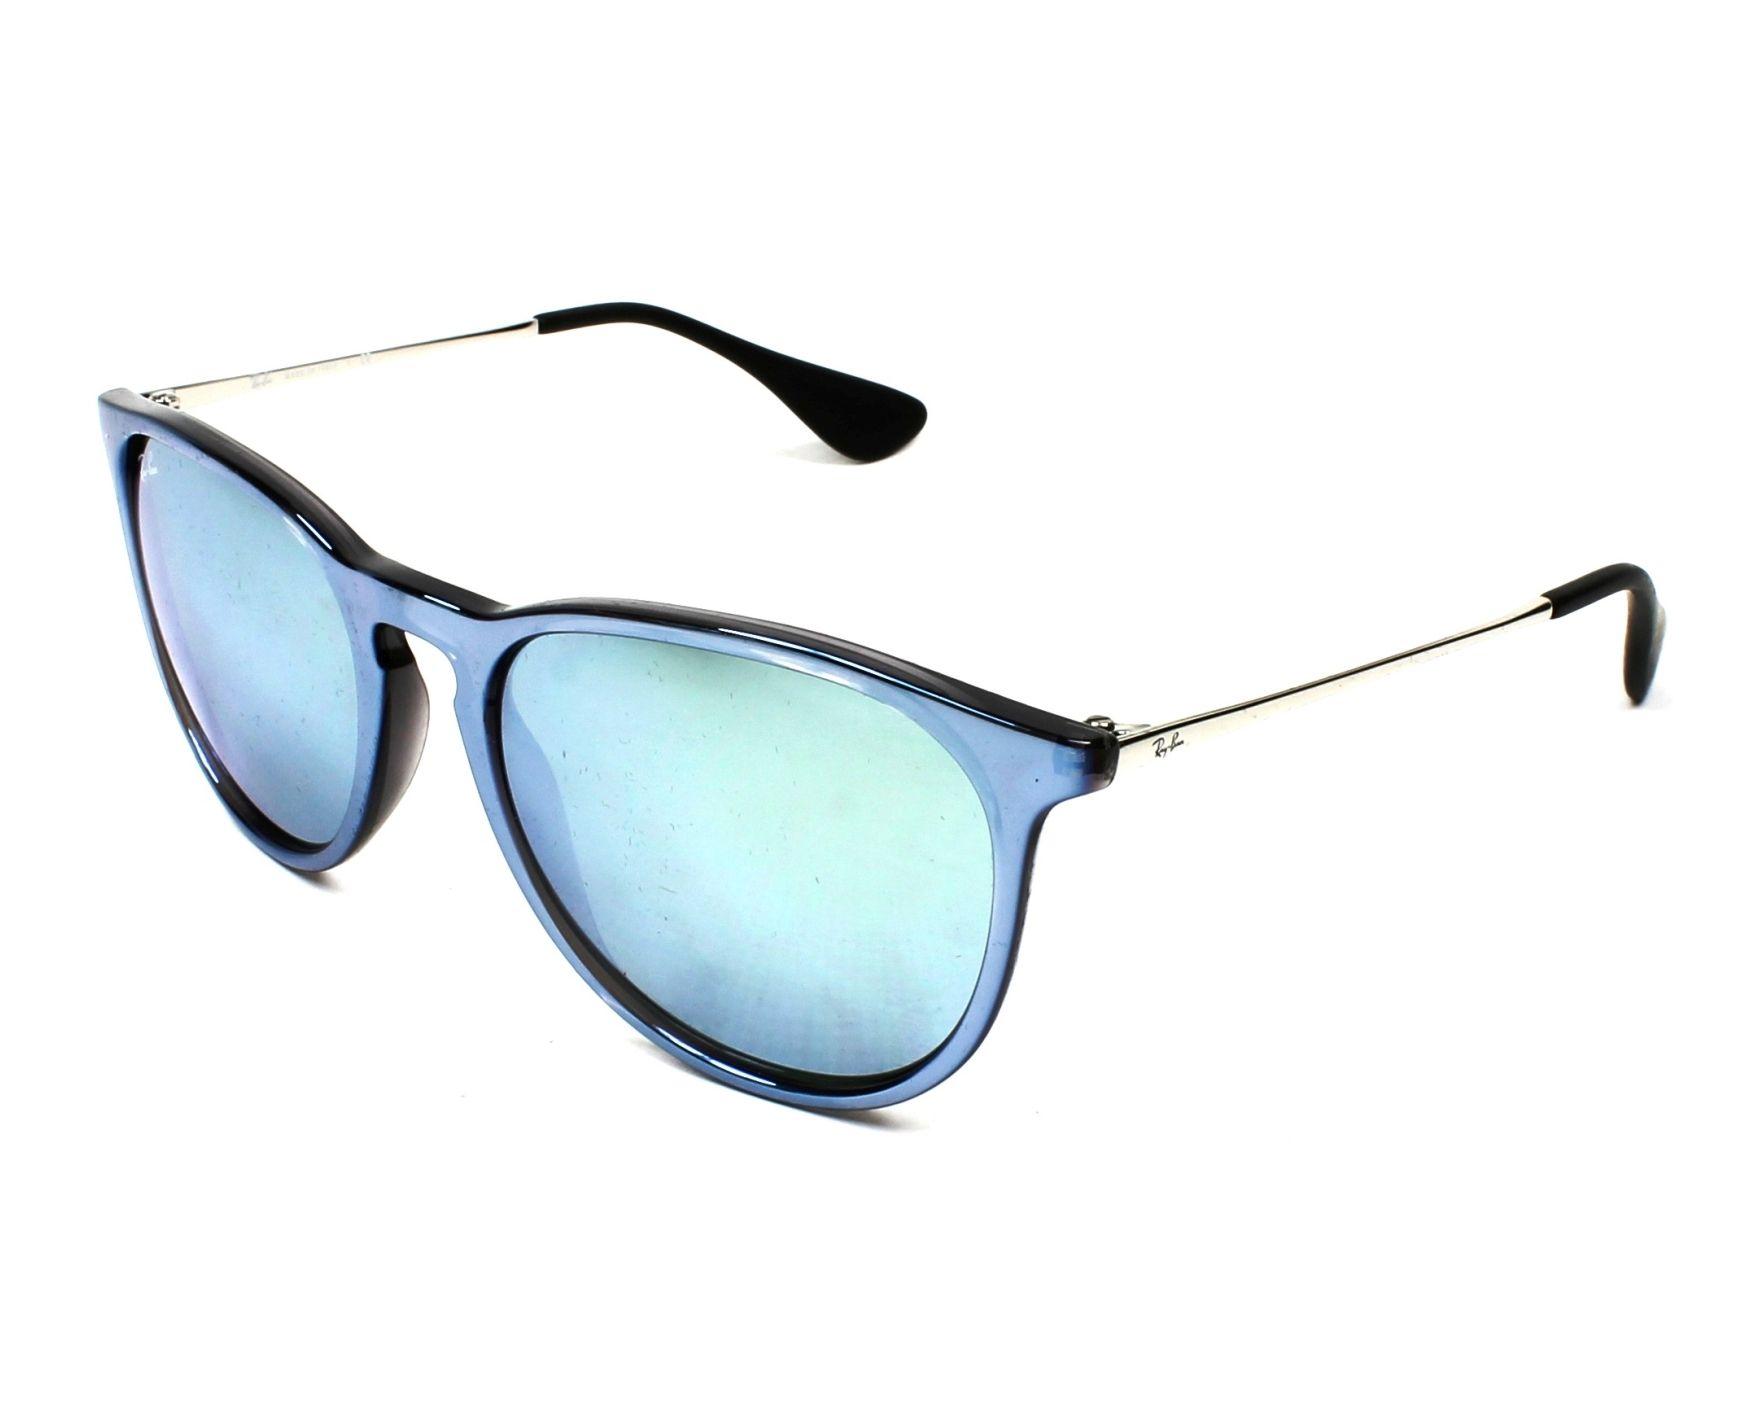 lunettes de soleil ray ban rb 4171 631930 bleu avec des verres gris vert. Black Bedroom Furniture Sets. Home Design Ideas